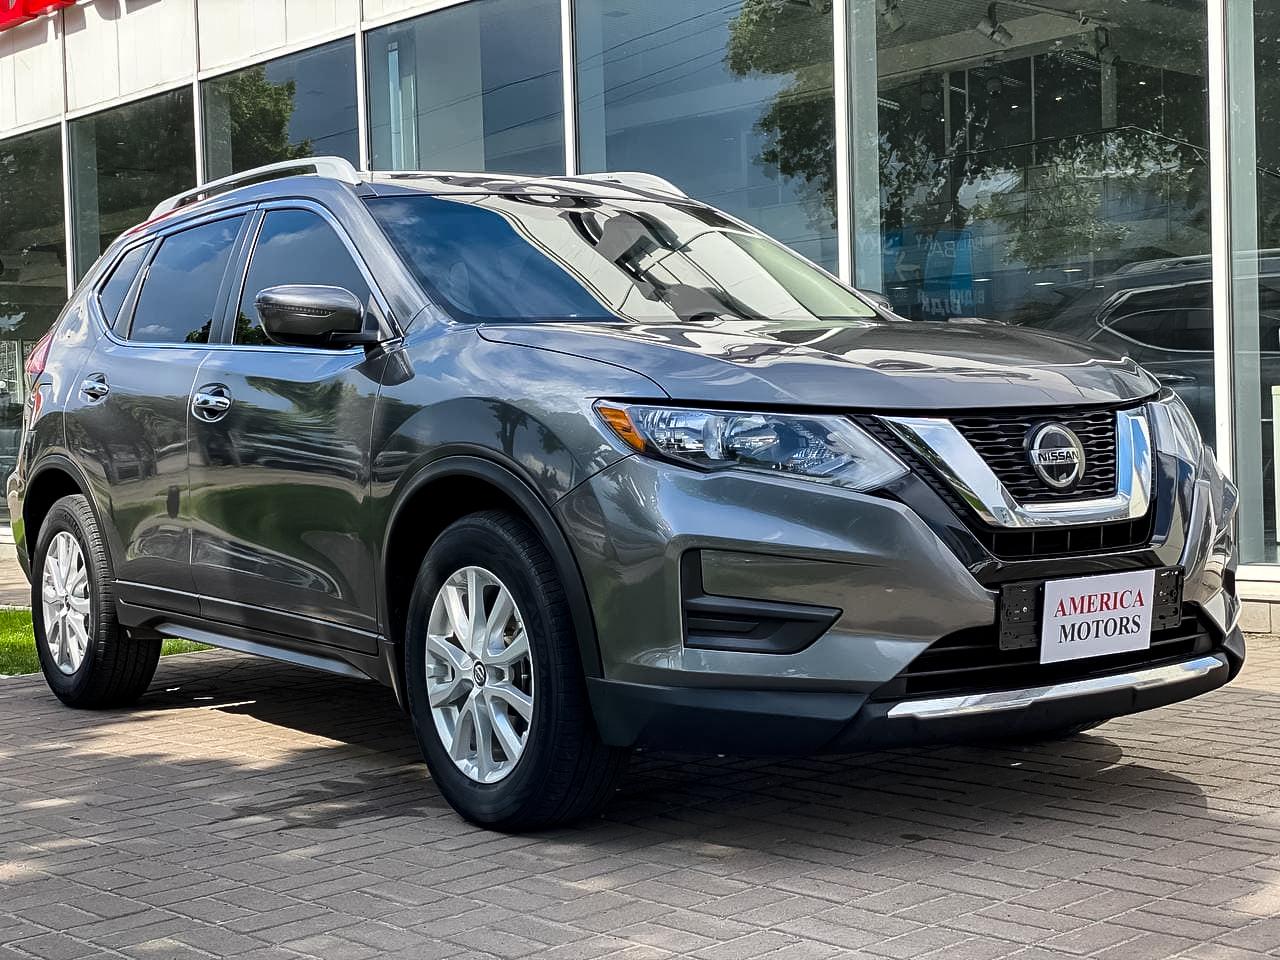 2018 Nissan ROGUE | Vin: 5N1AT2MTXJC783254